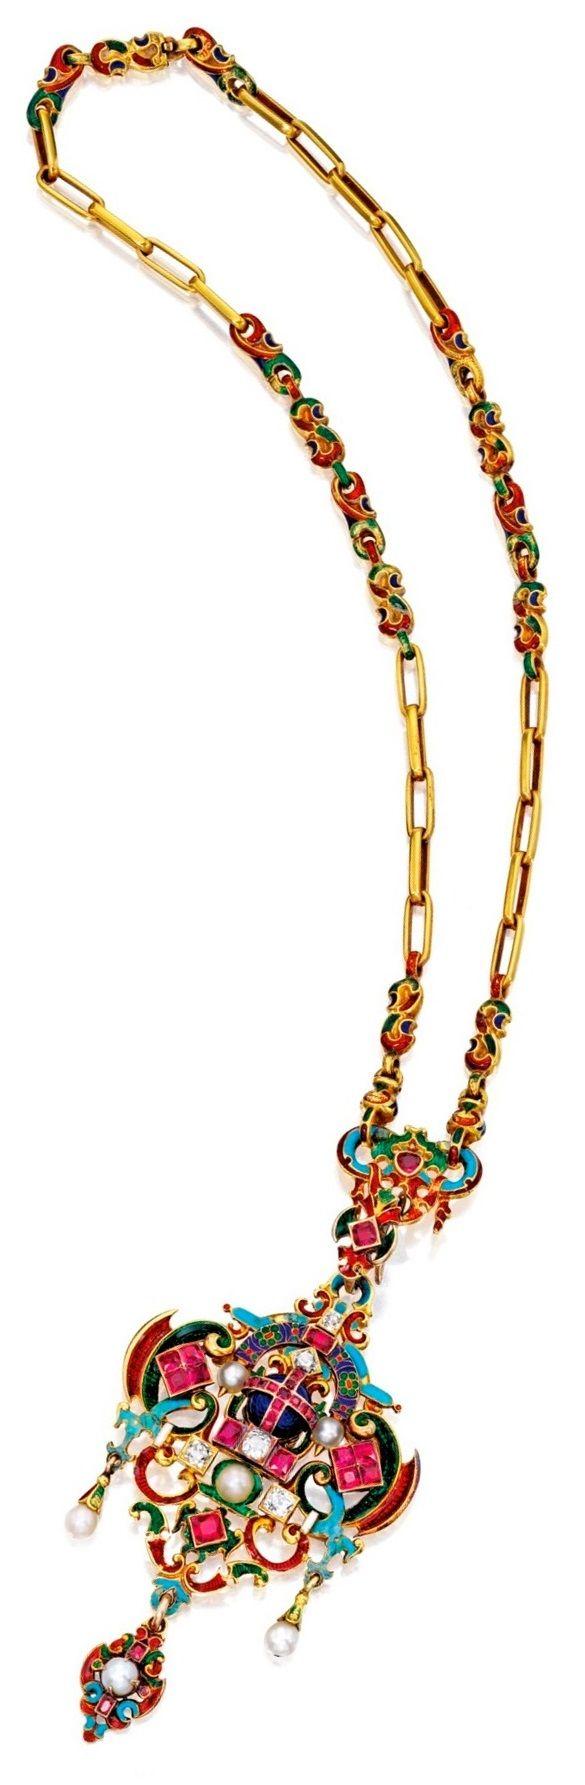 Renaissance-Revival Gold, Enamel and Gem-Set Necklace. The pendant and chain…